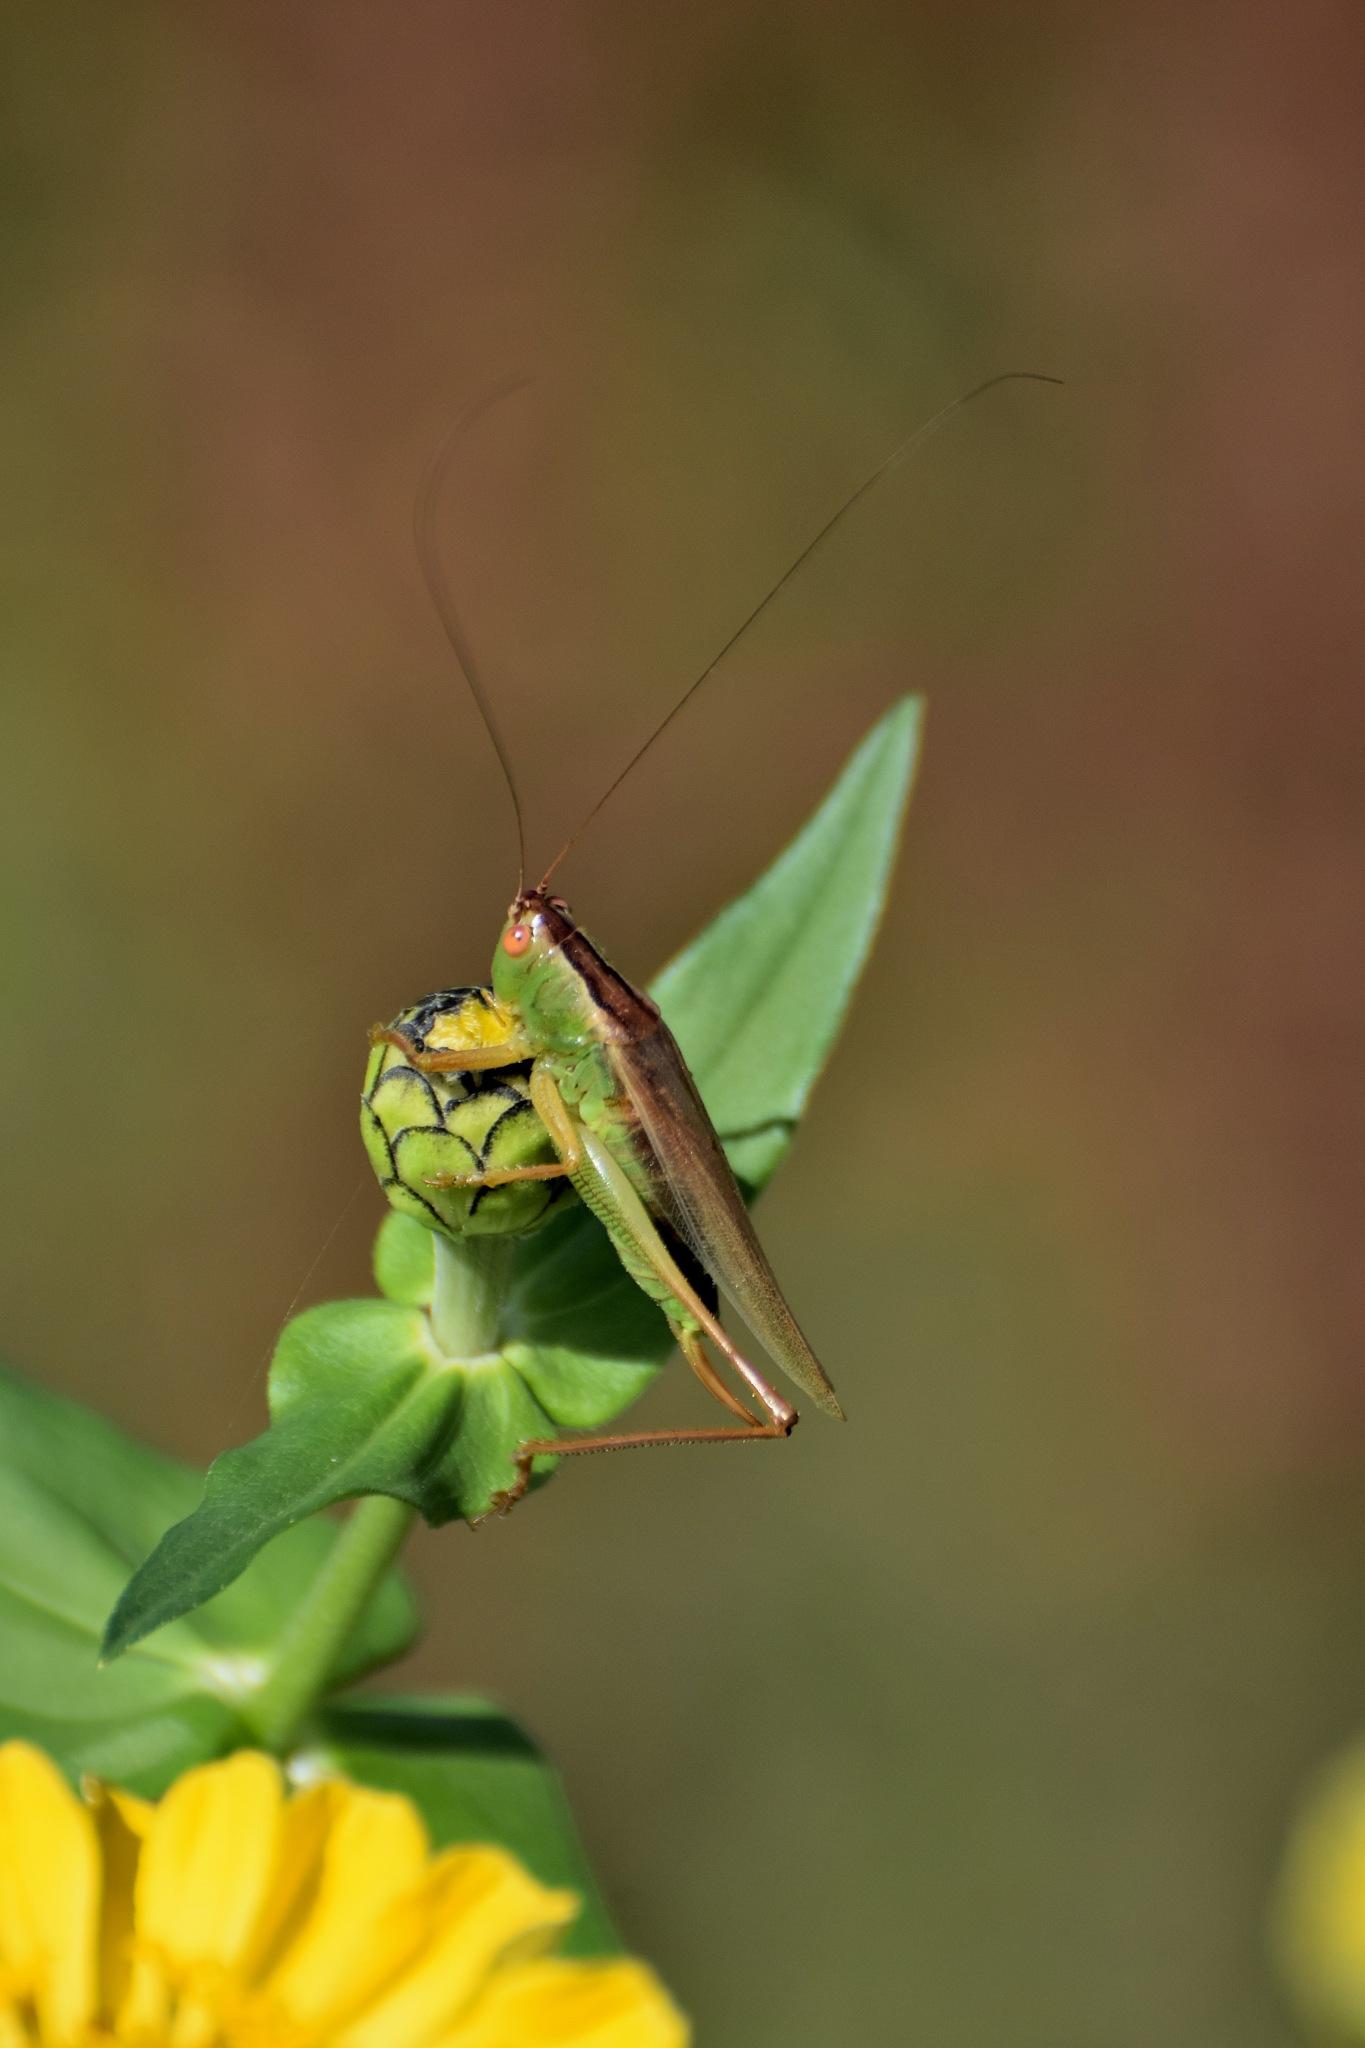 Todays Art 5363~The Grasshopper by Lawrence Scott Hess